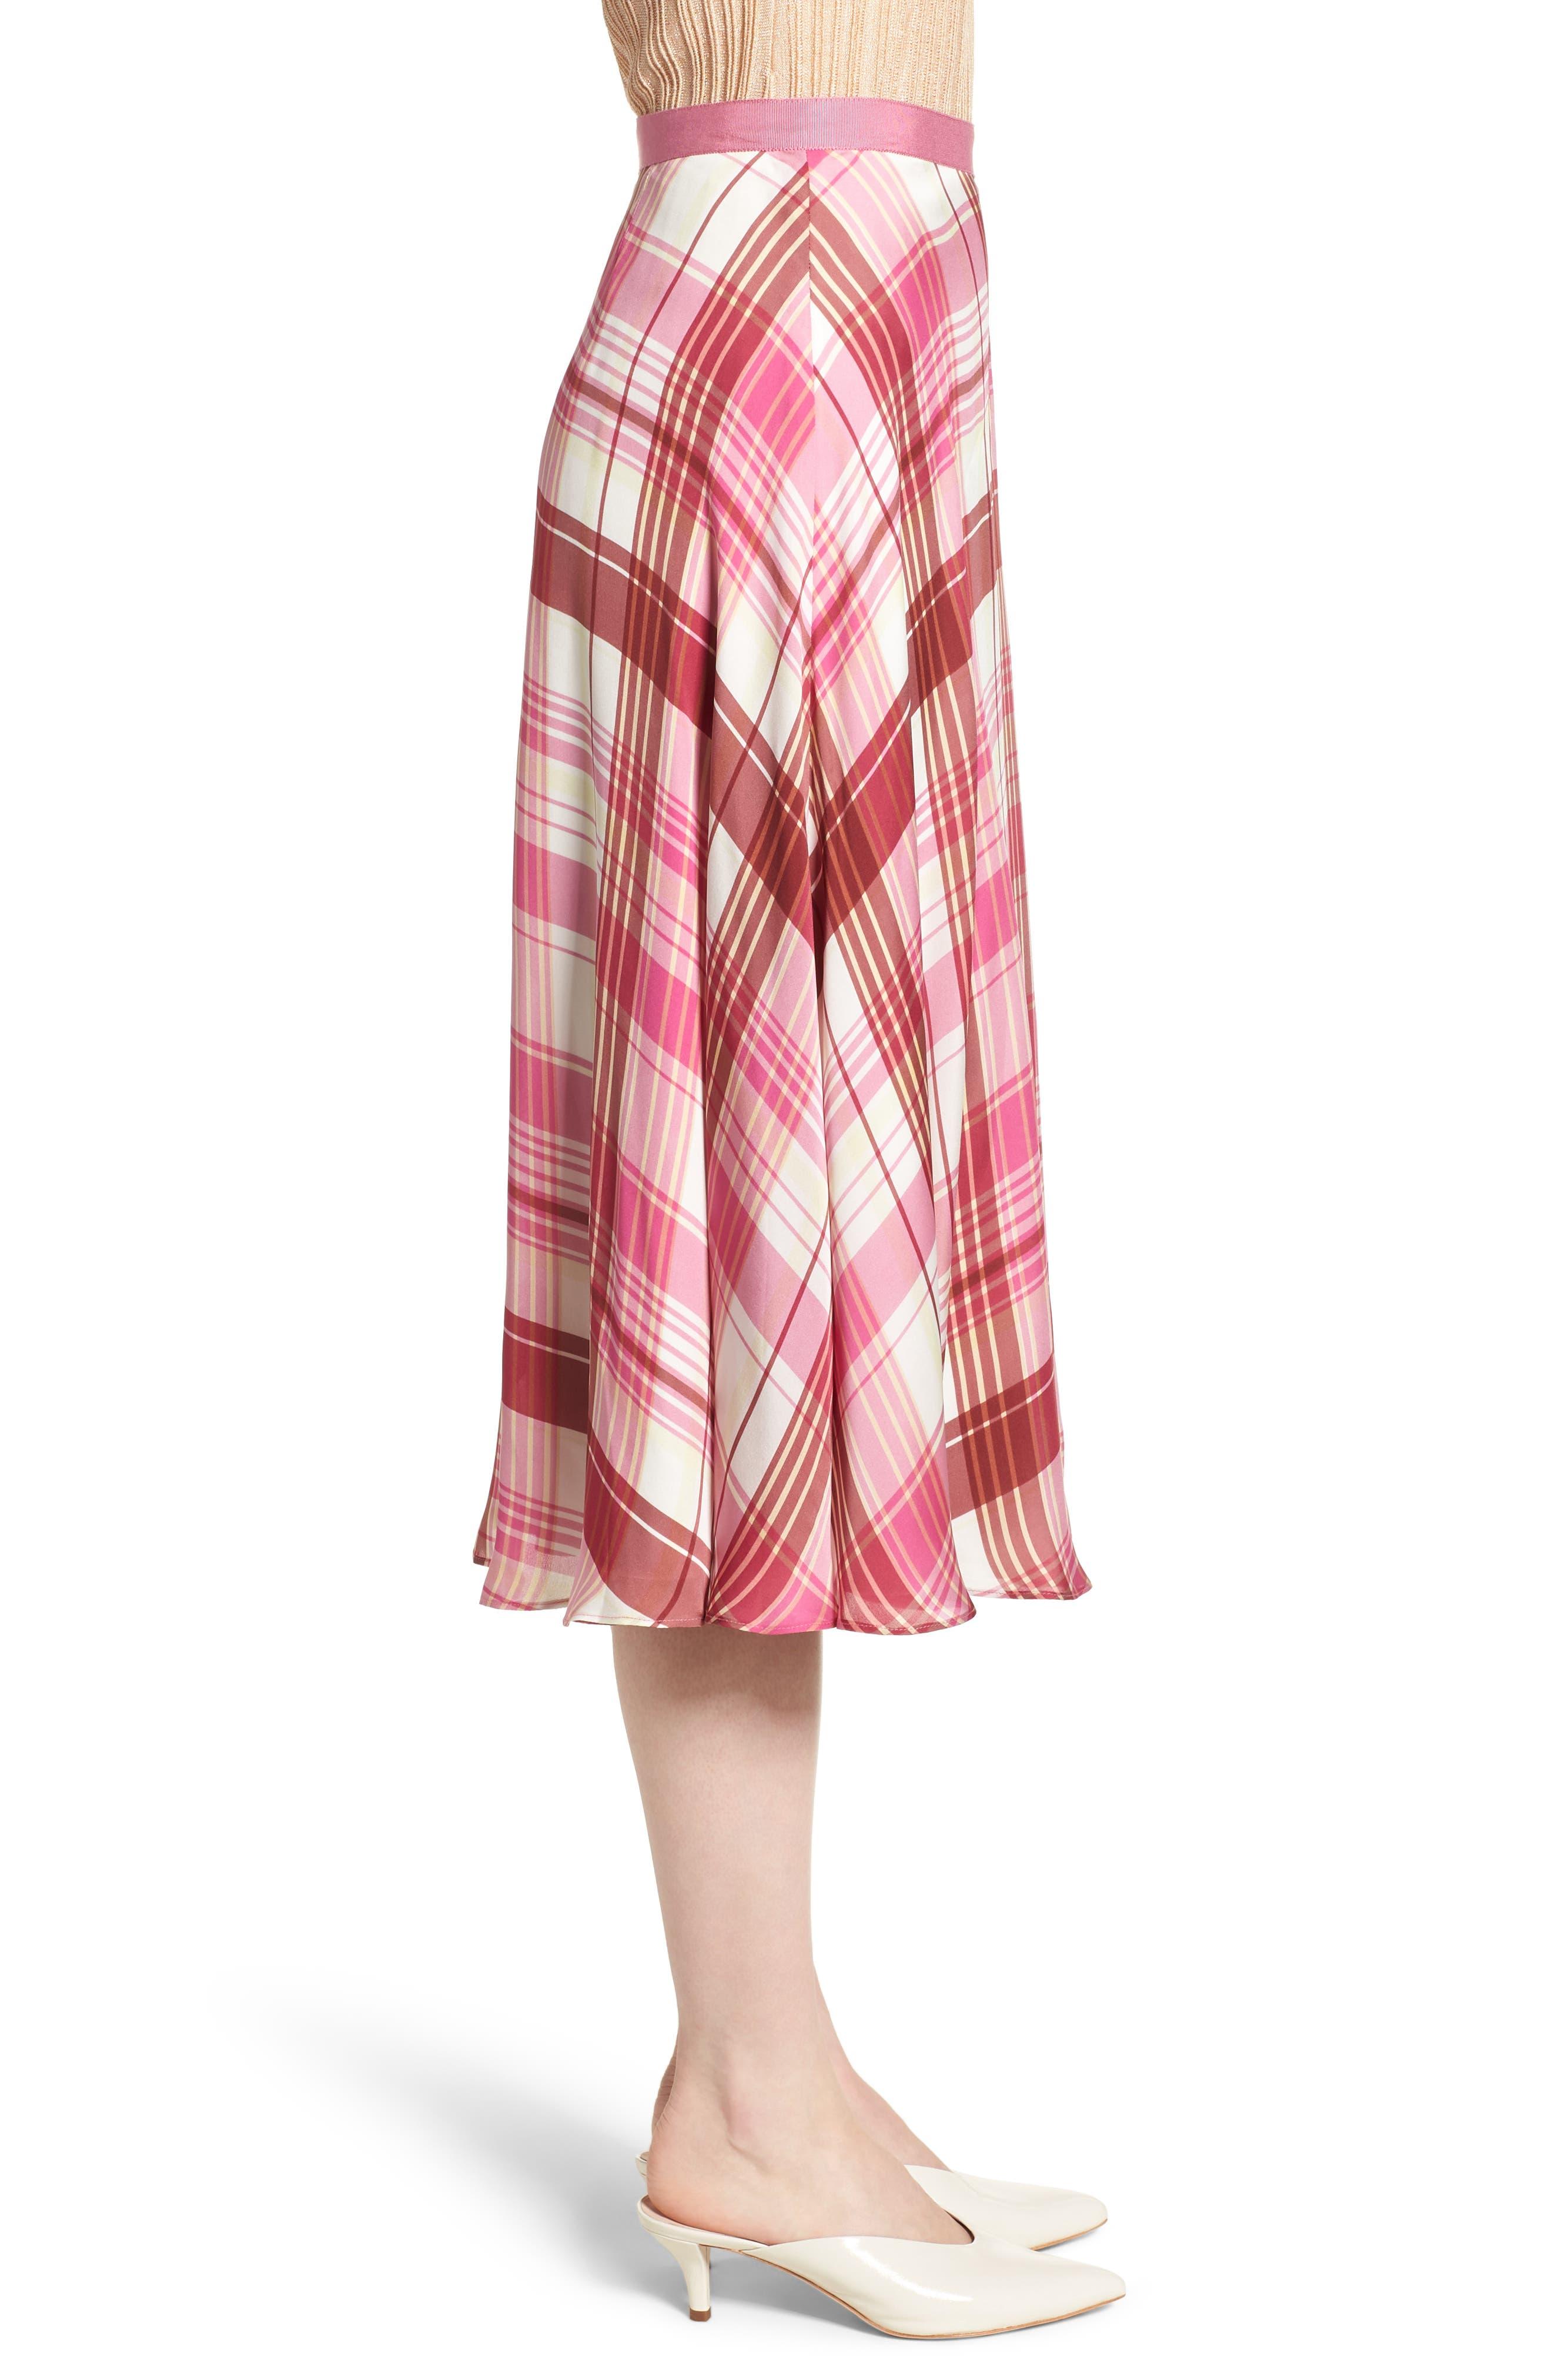 Plaid Silk Skirt,                             Alternate thumbnail 3, color,                             PINK PHLOX LARA PLAID